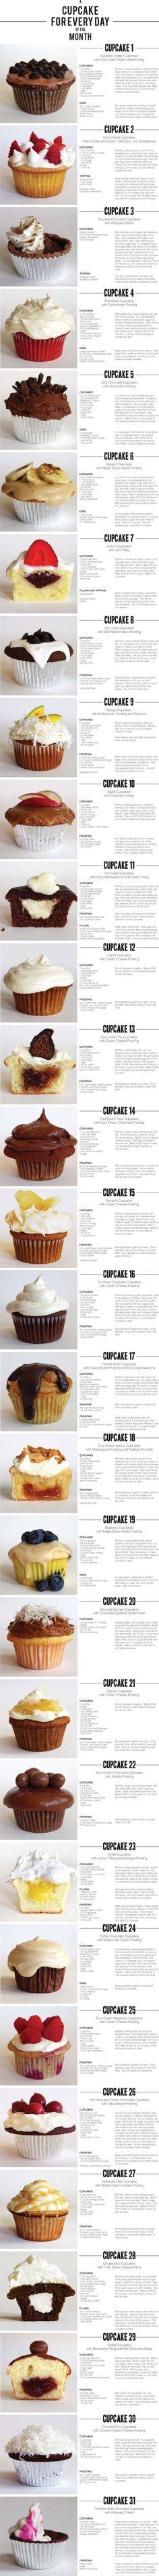 ◆ Visit MACHINE Shop Café ◆ for Cuisine As Art @ MACHINE (Cupcake Recipe Names List)